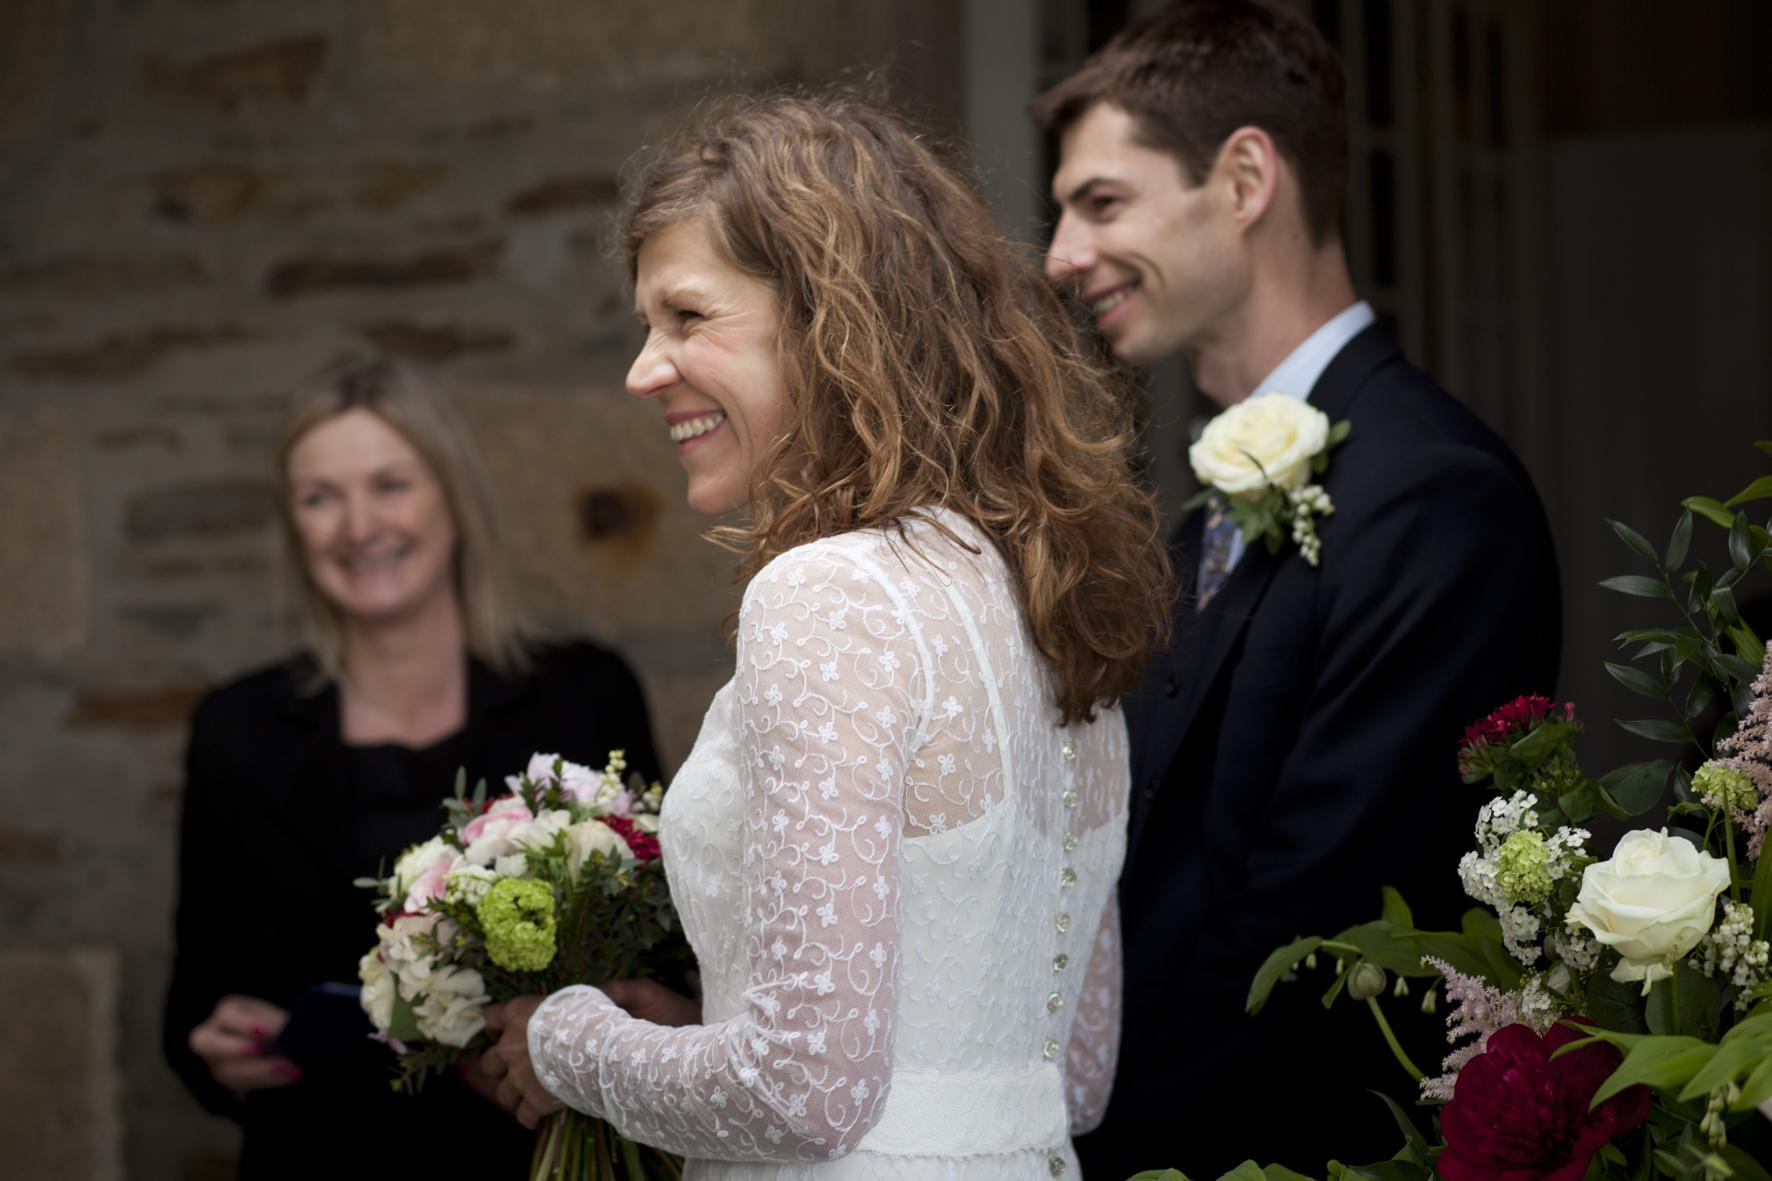 Wedding example_M&P__MG_3358_Claudia Leisinger.jpg